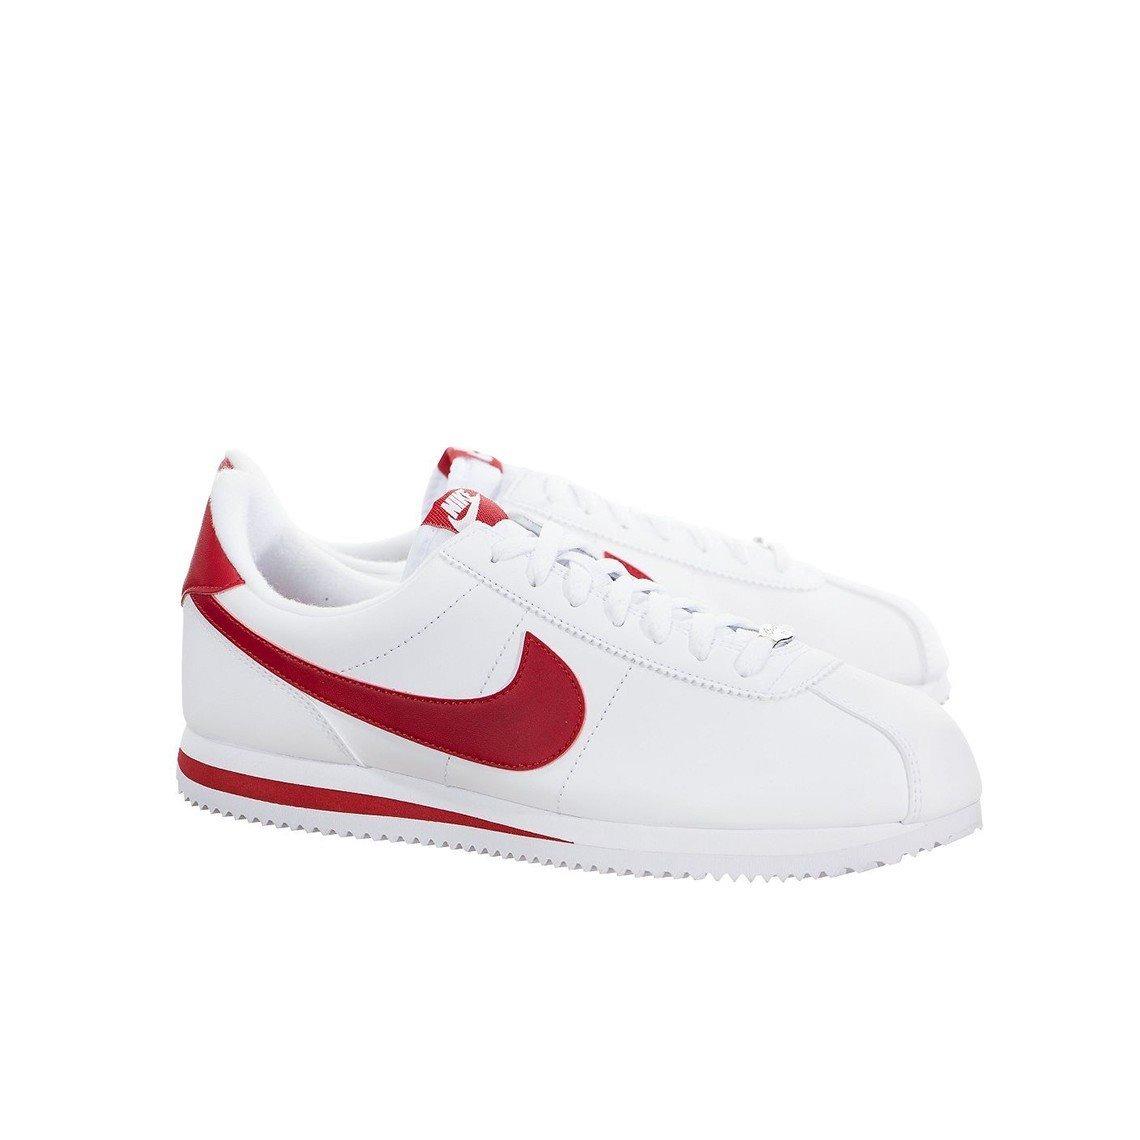 ca333b5a2dd Tenis Nike Cortez Basic Leather Blanco-rojo  6 (piel) -   1